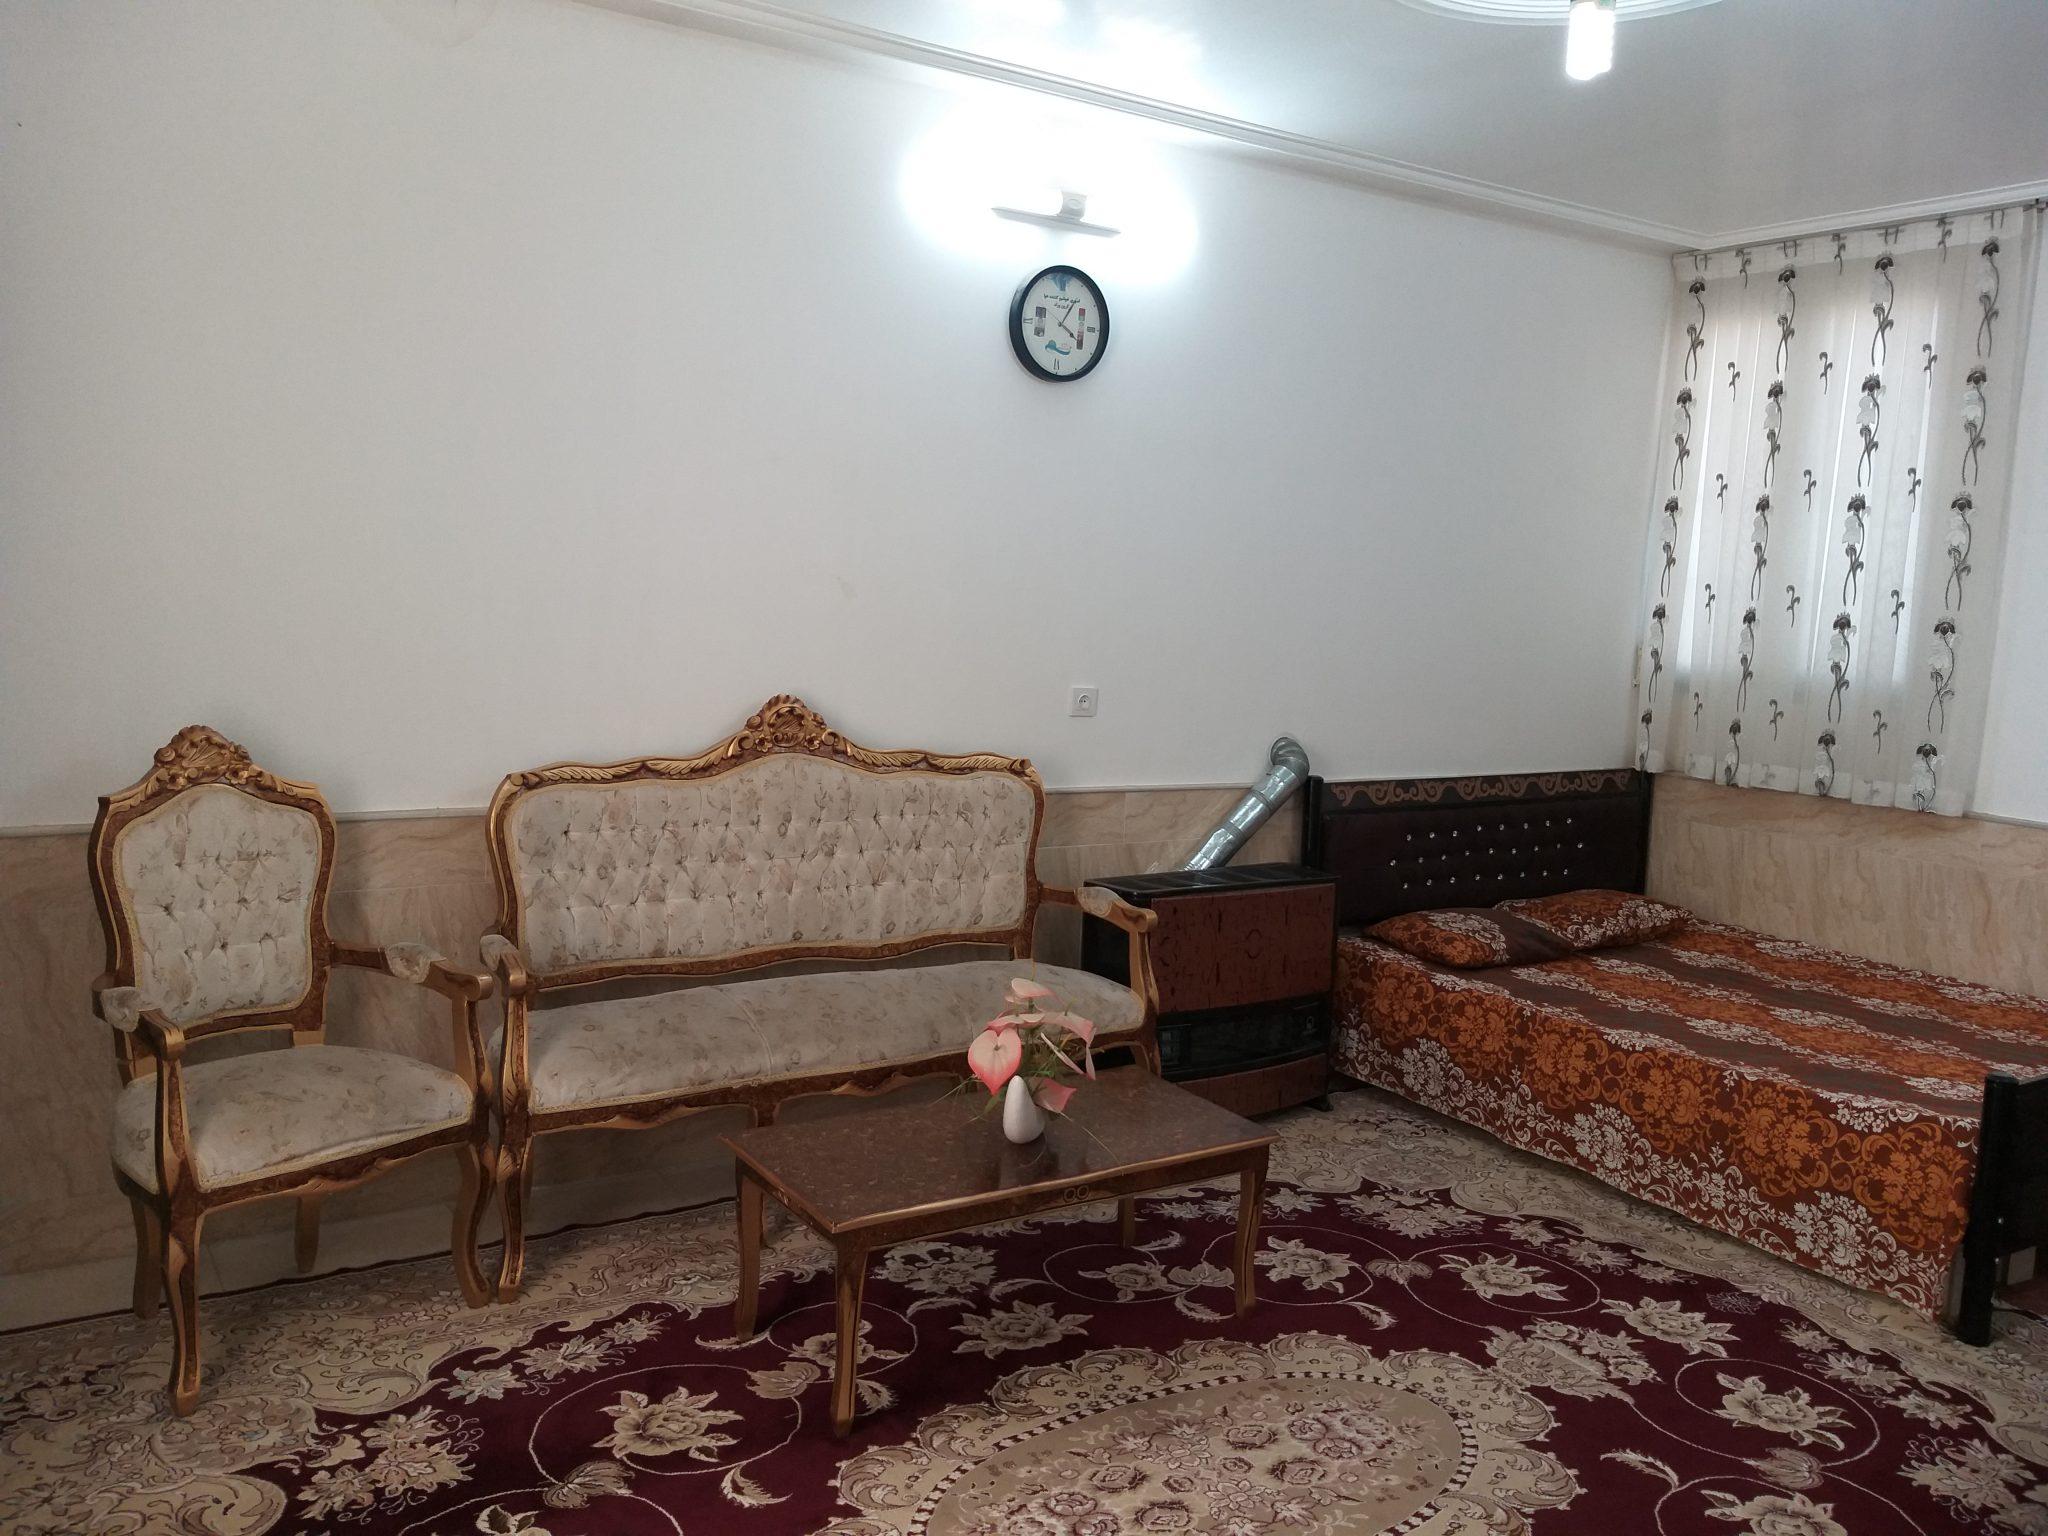 اجاره سوئیت در کاشان-کد ۱۰۲